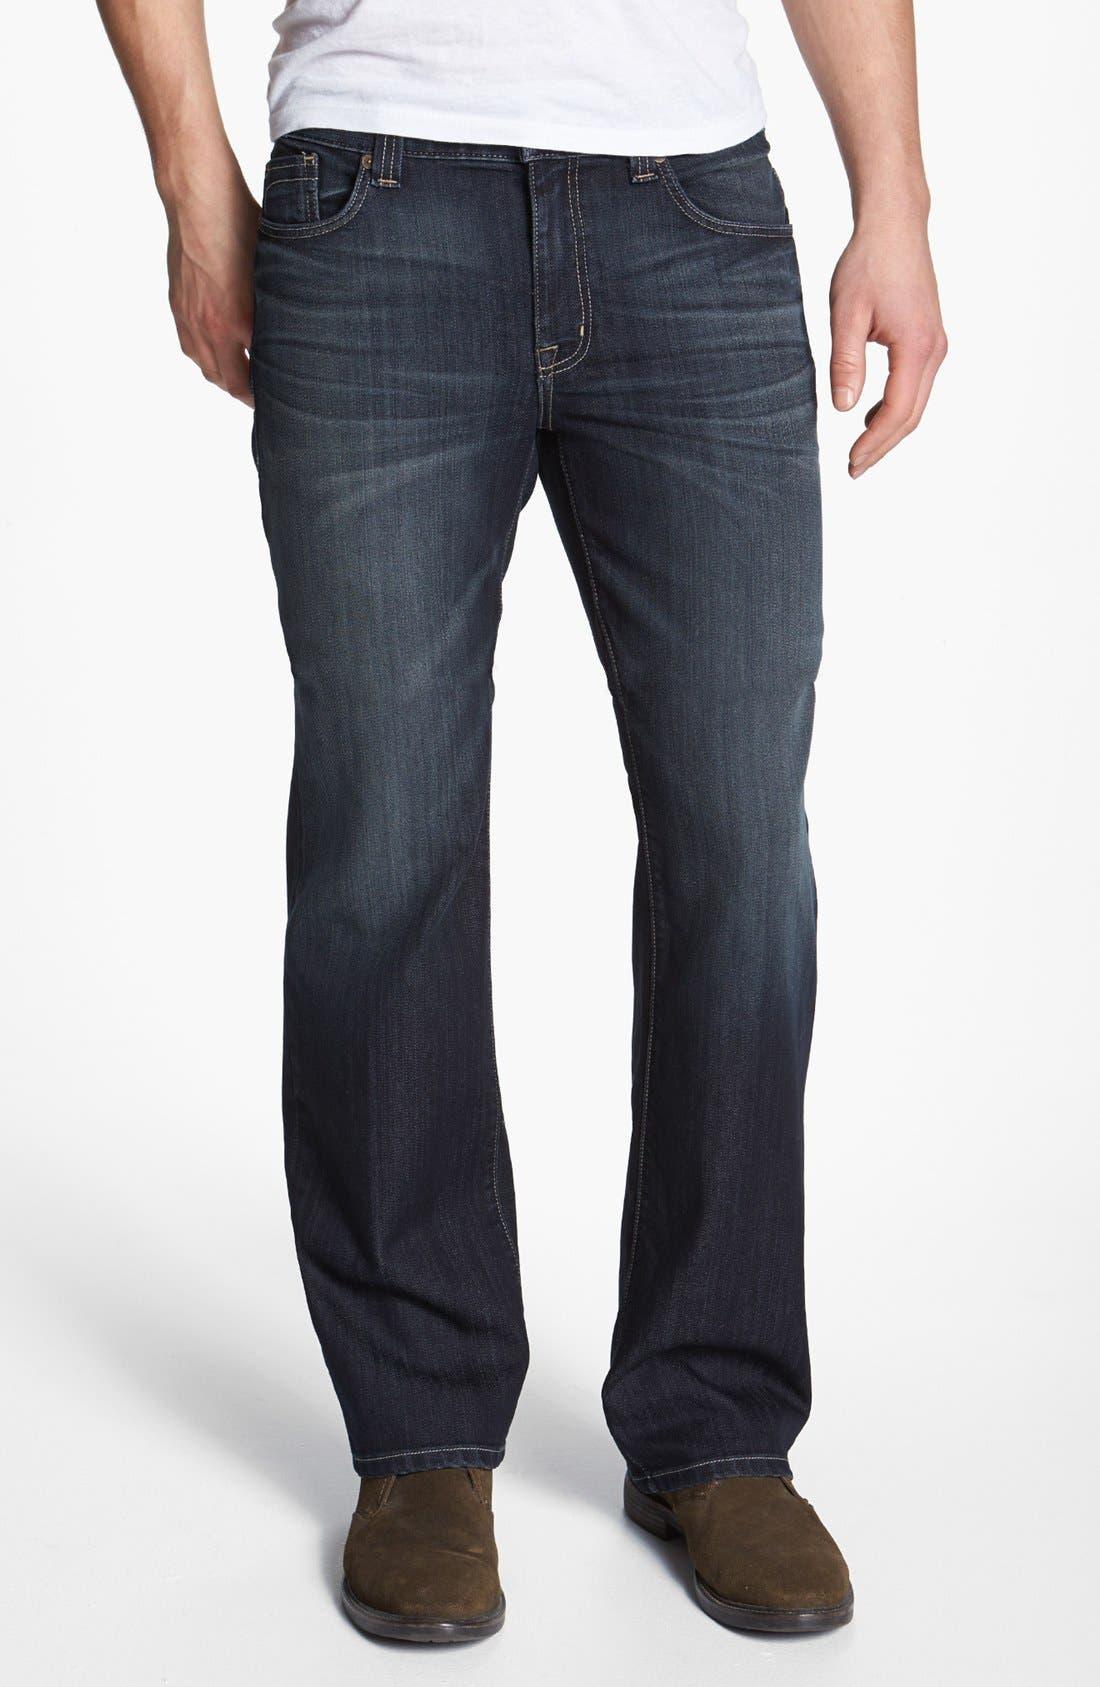 Main Image - Fidelity Denim 'Camino' Relaxed Leg Jeans (Trigger Marx)